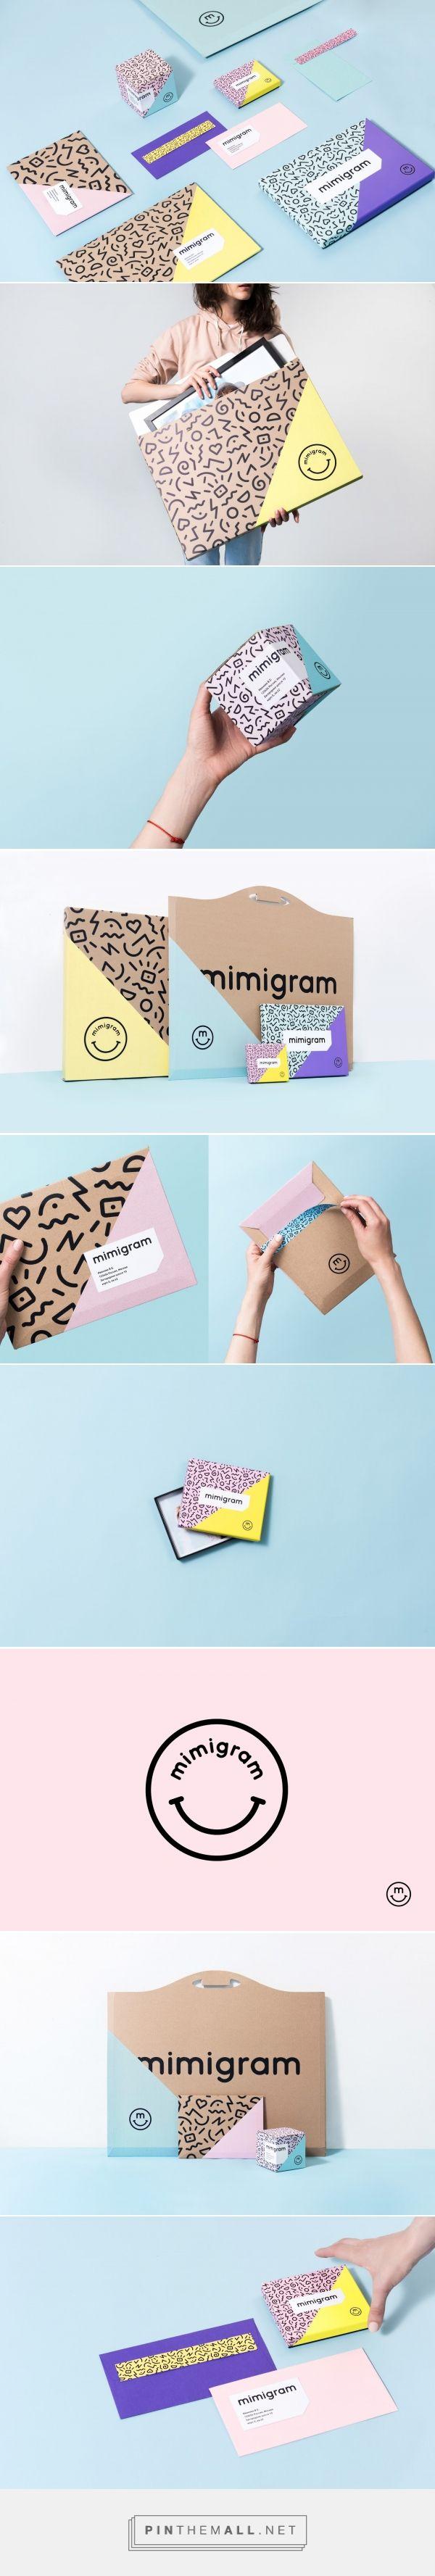 Mimigram packaging design by MADE design studio - http://www.packagingoftheworld.com/2018/01/mimigram.html